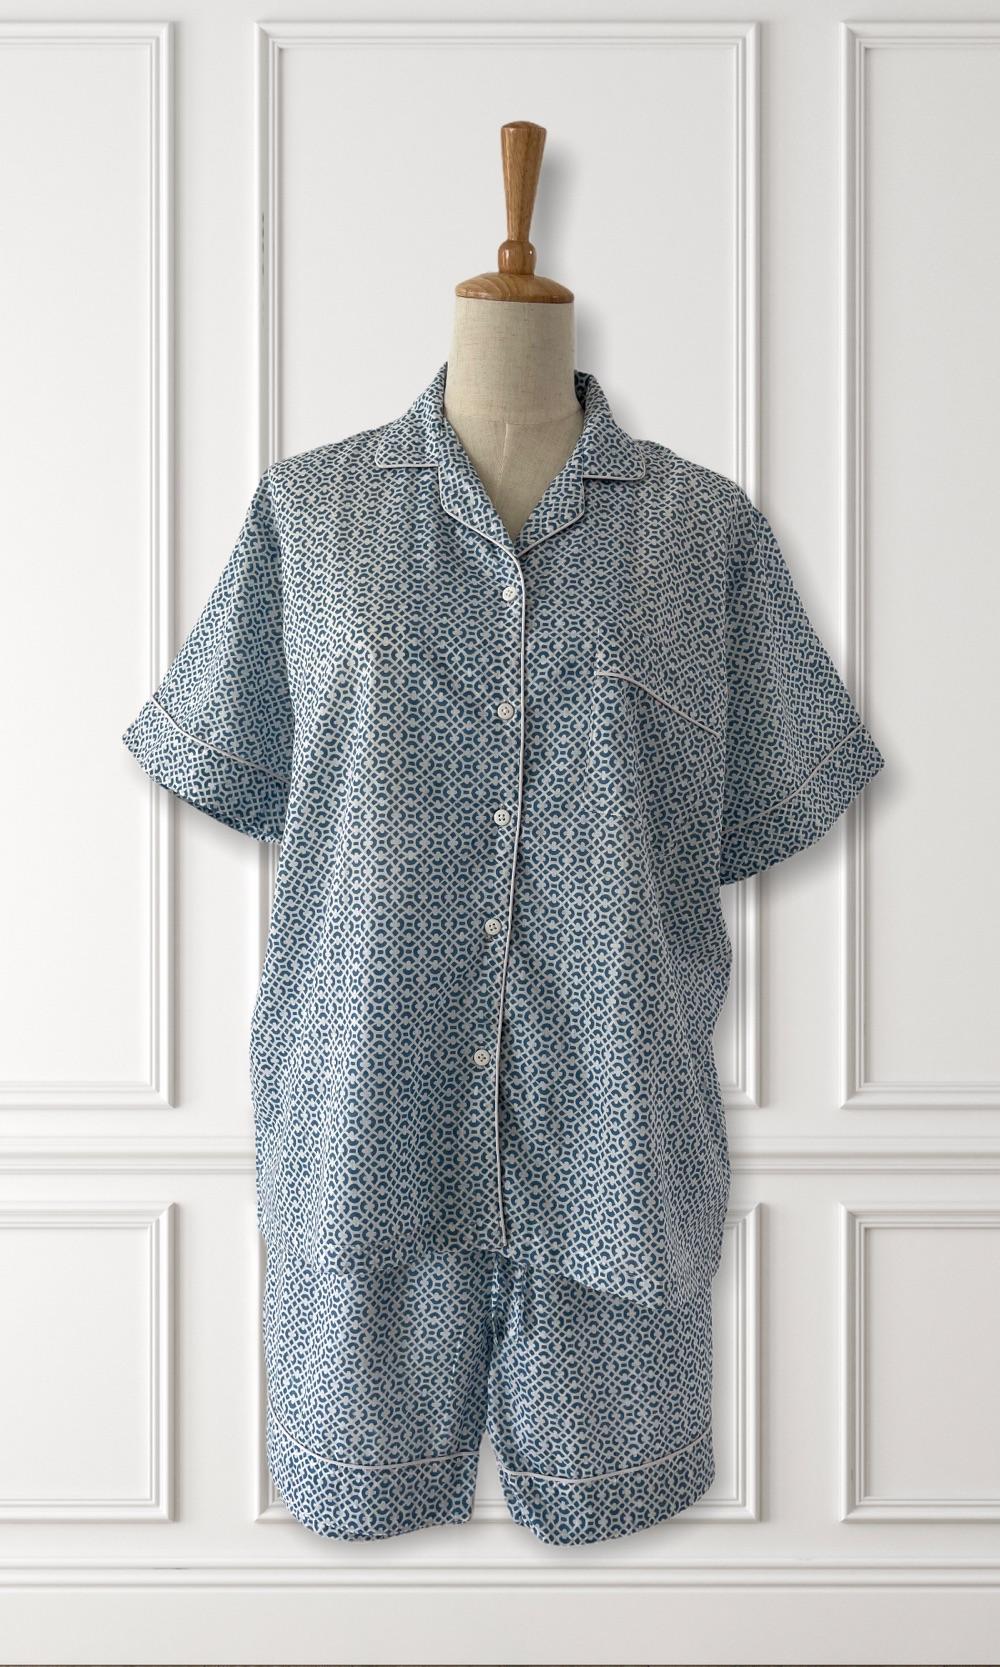 Hand Block Printed Cotton Pyjamas for Women